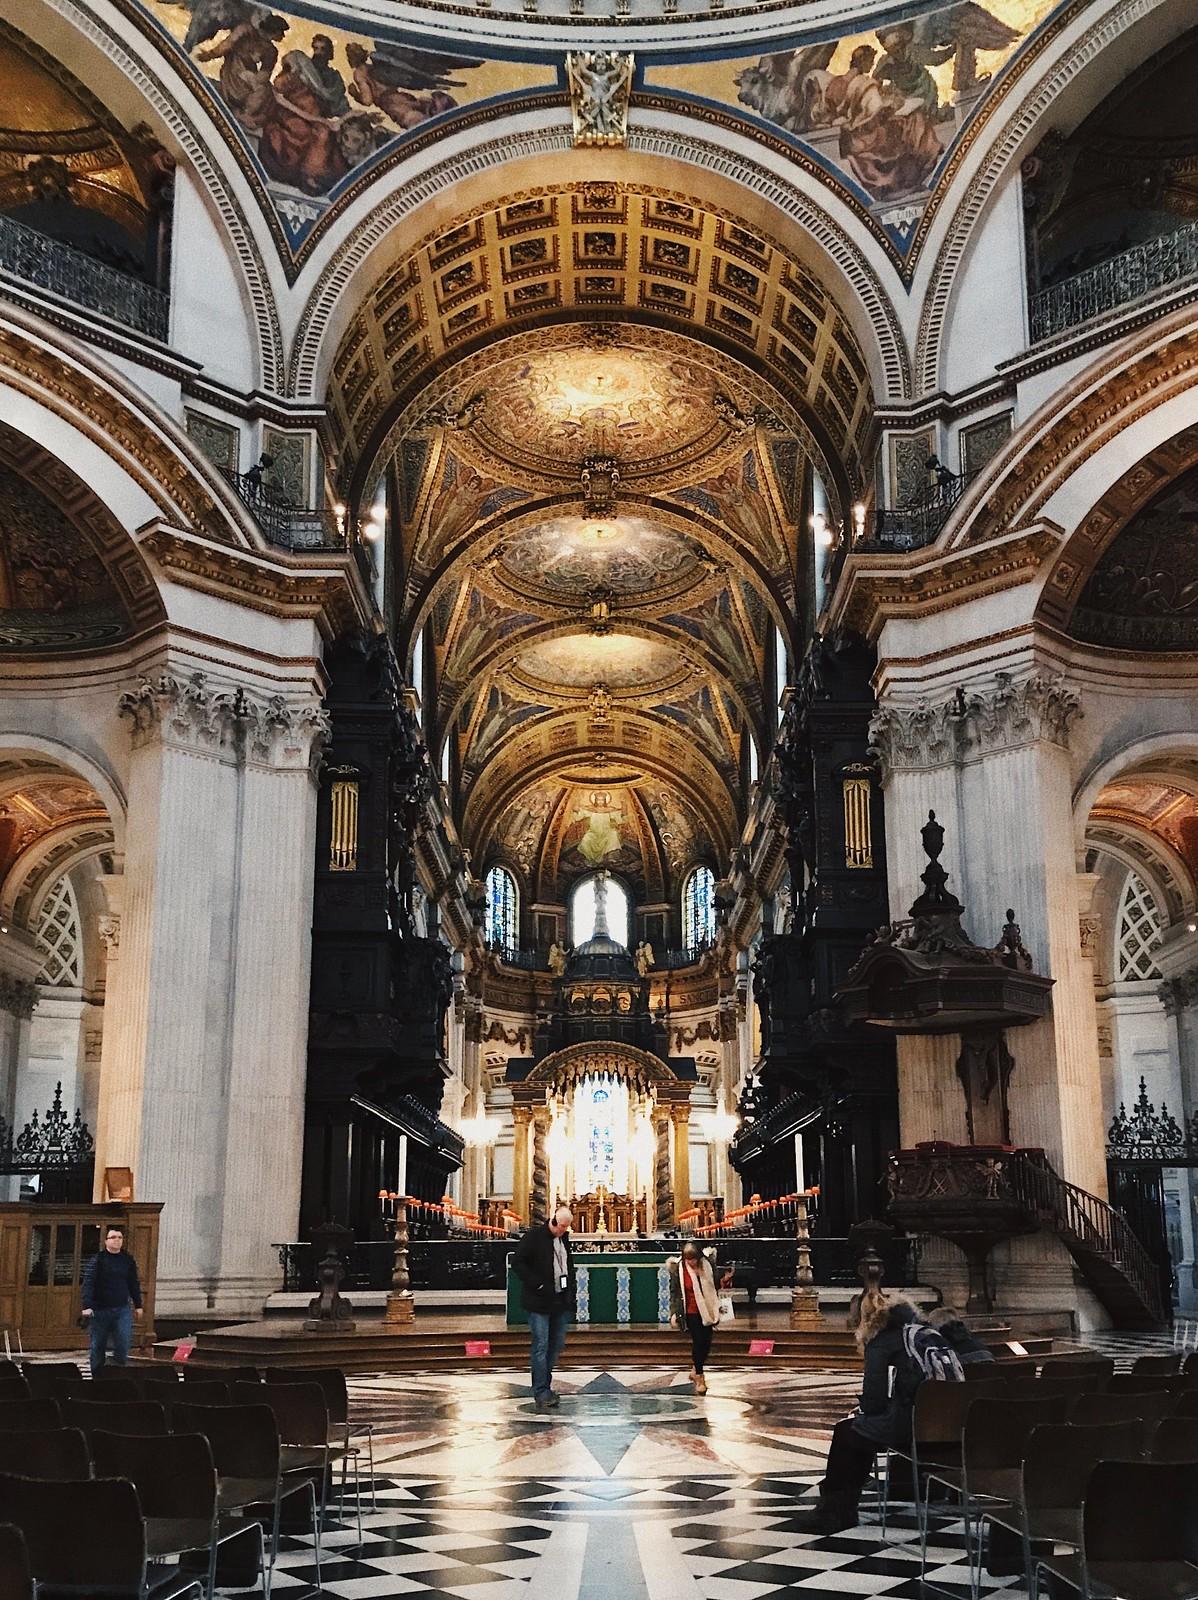 St Paulin katedraali